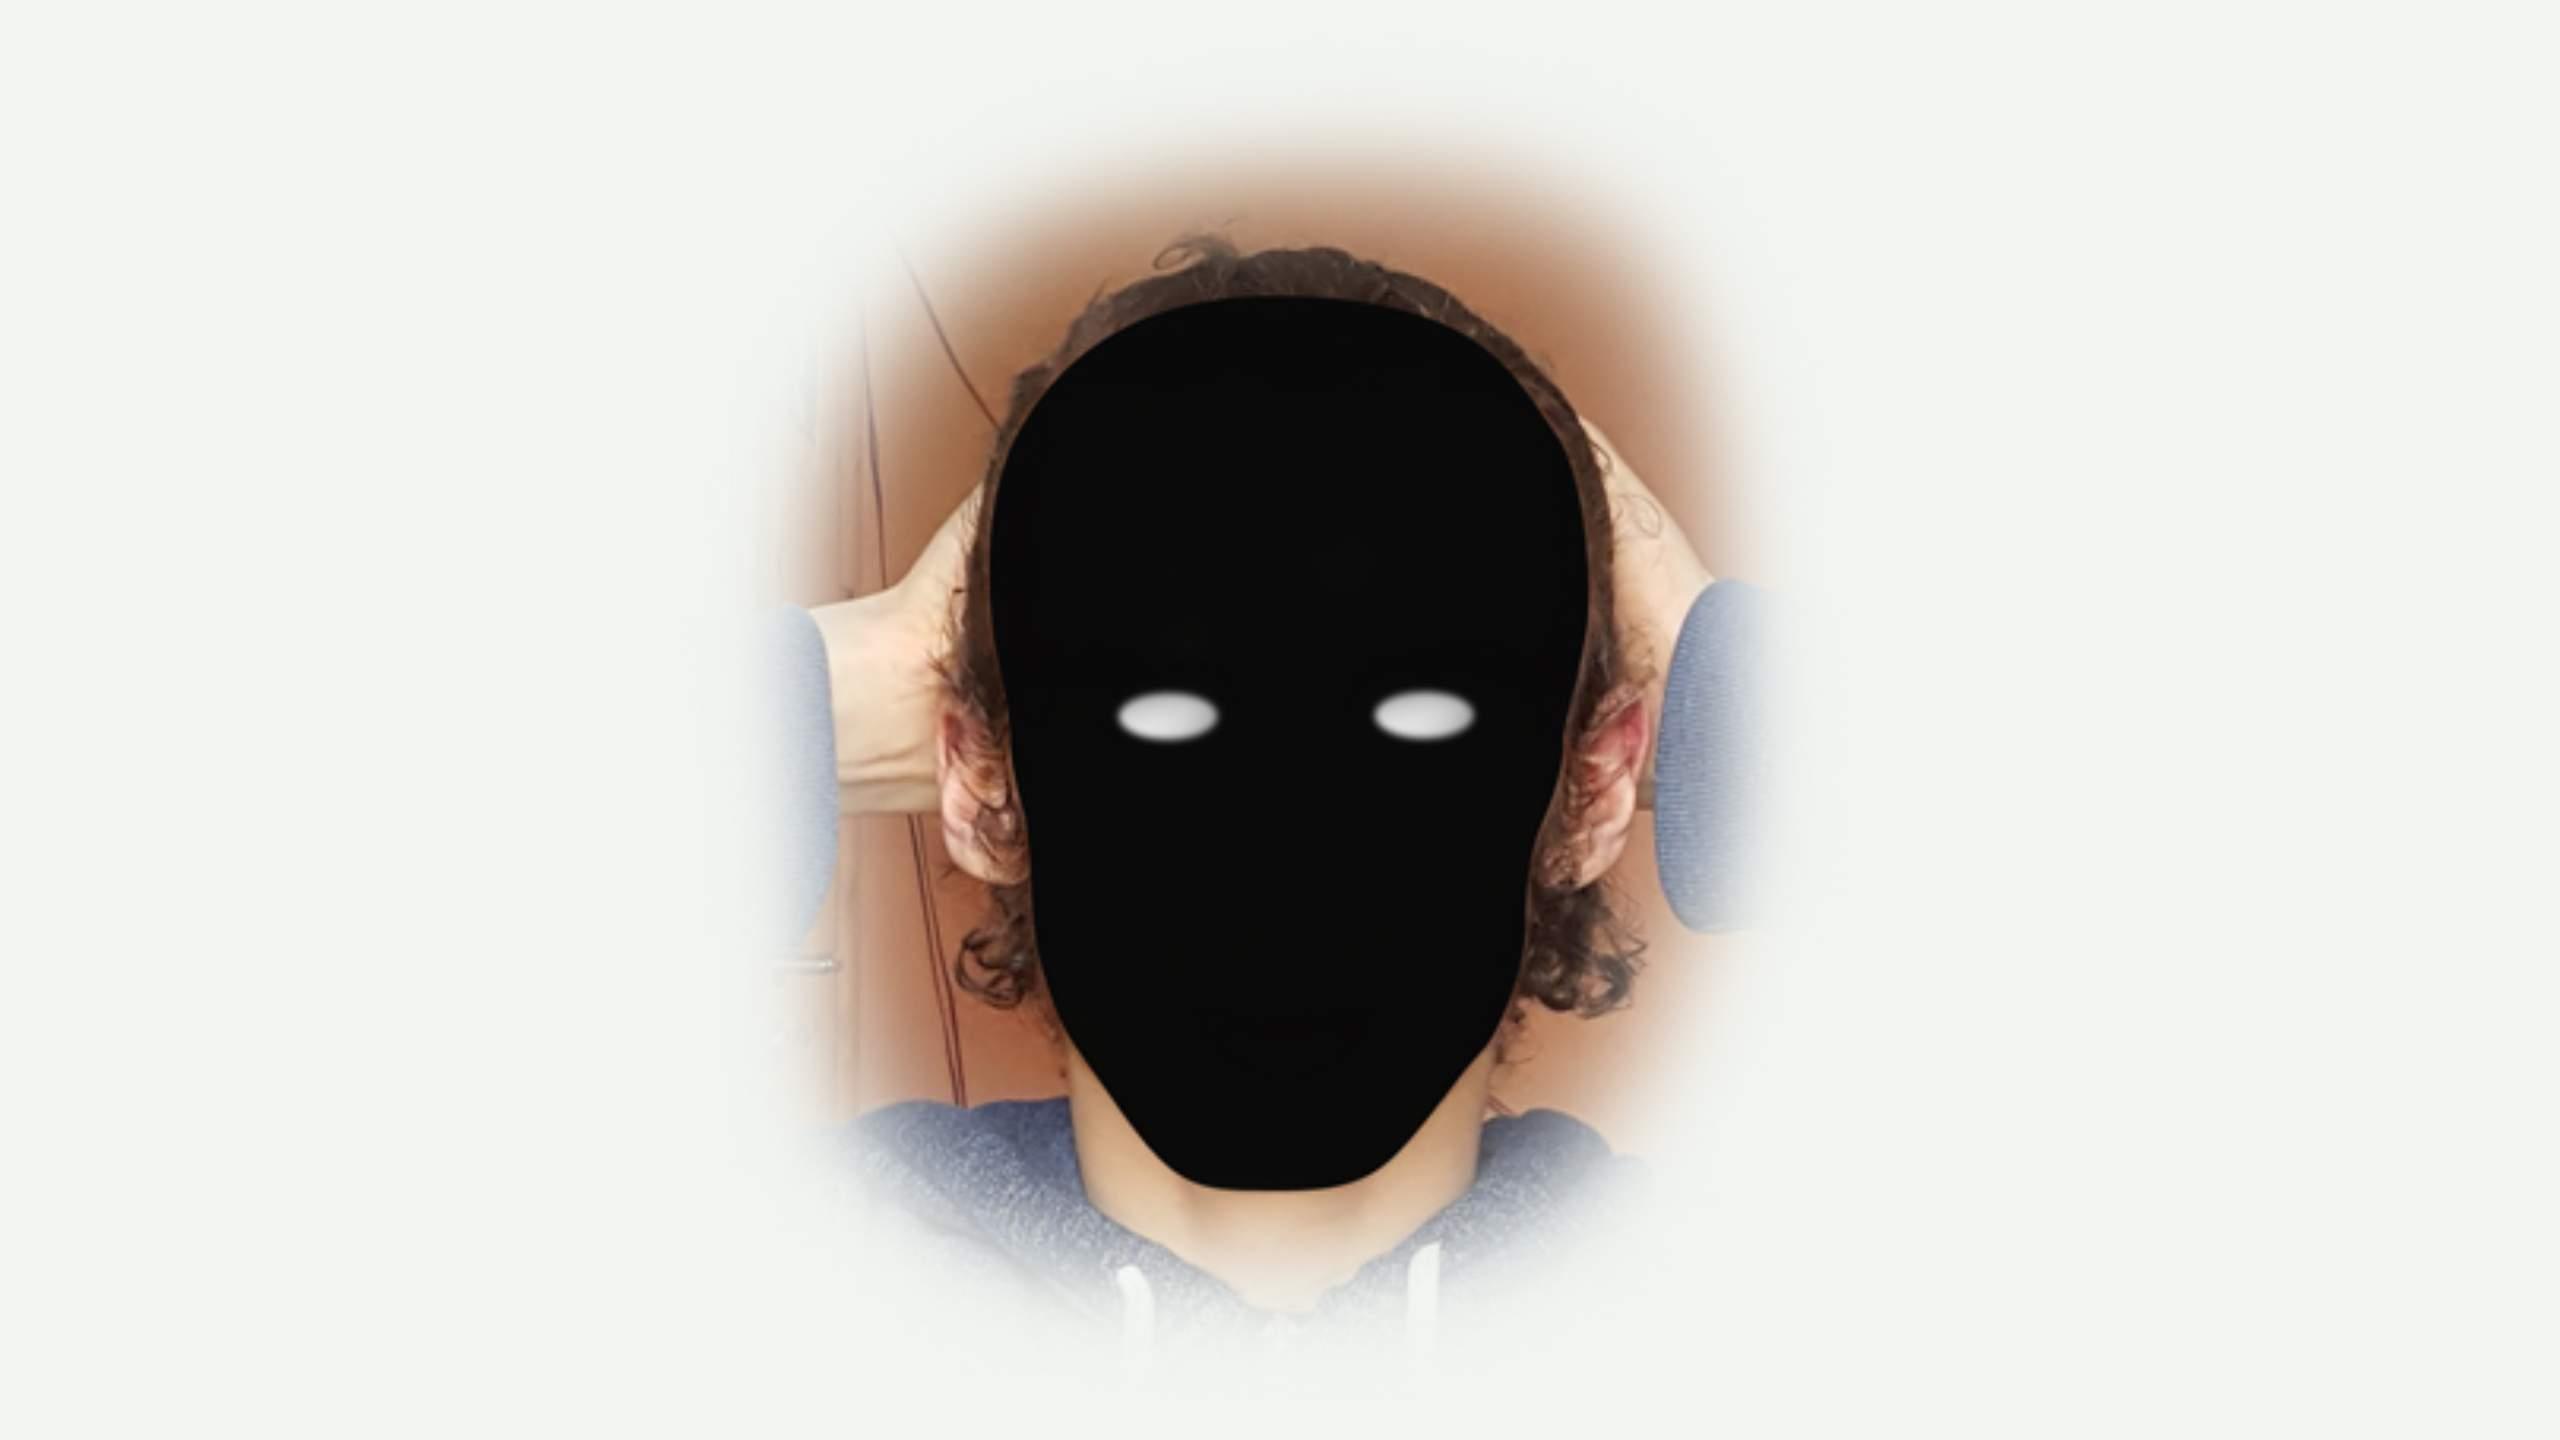 Kopfform glatze Glatze und